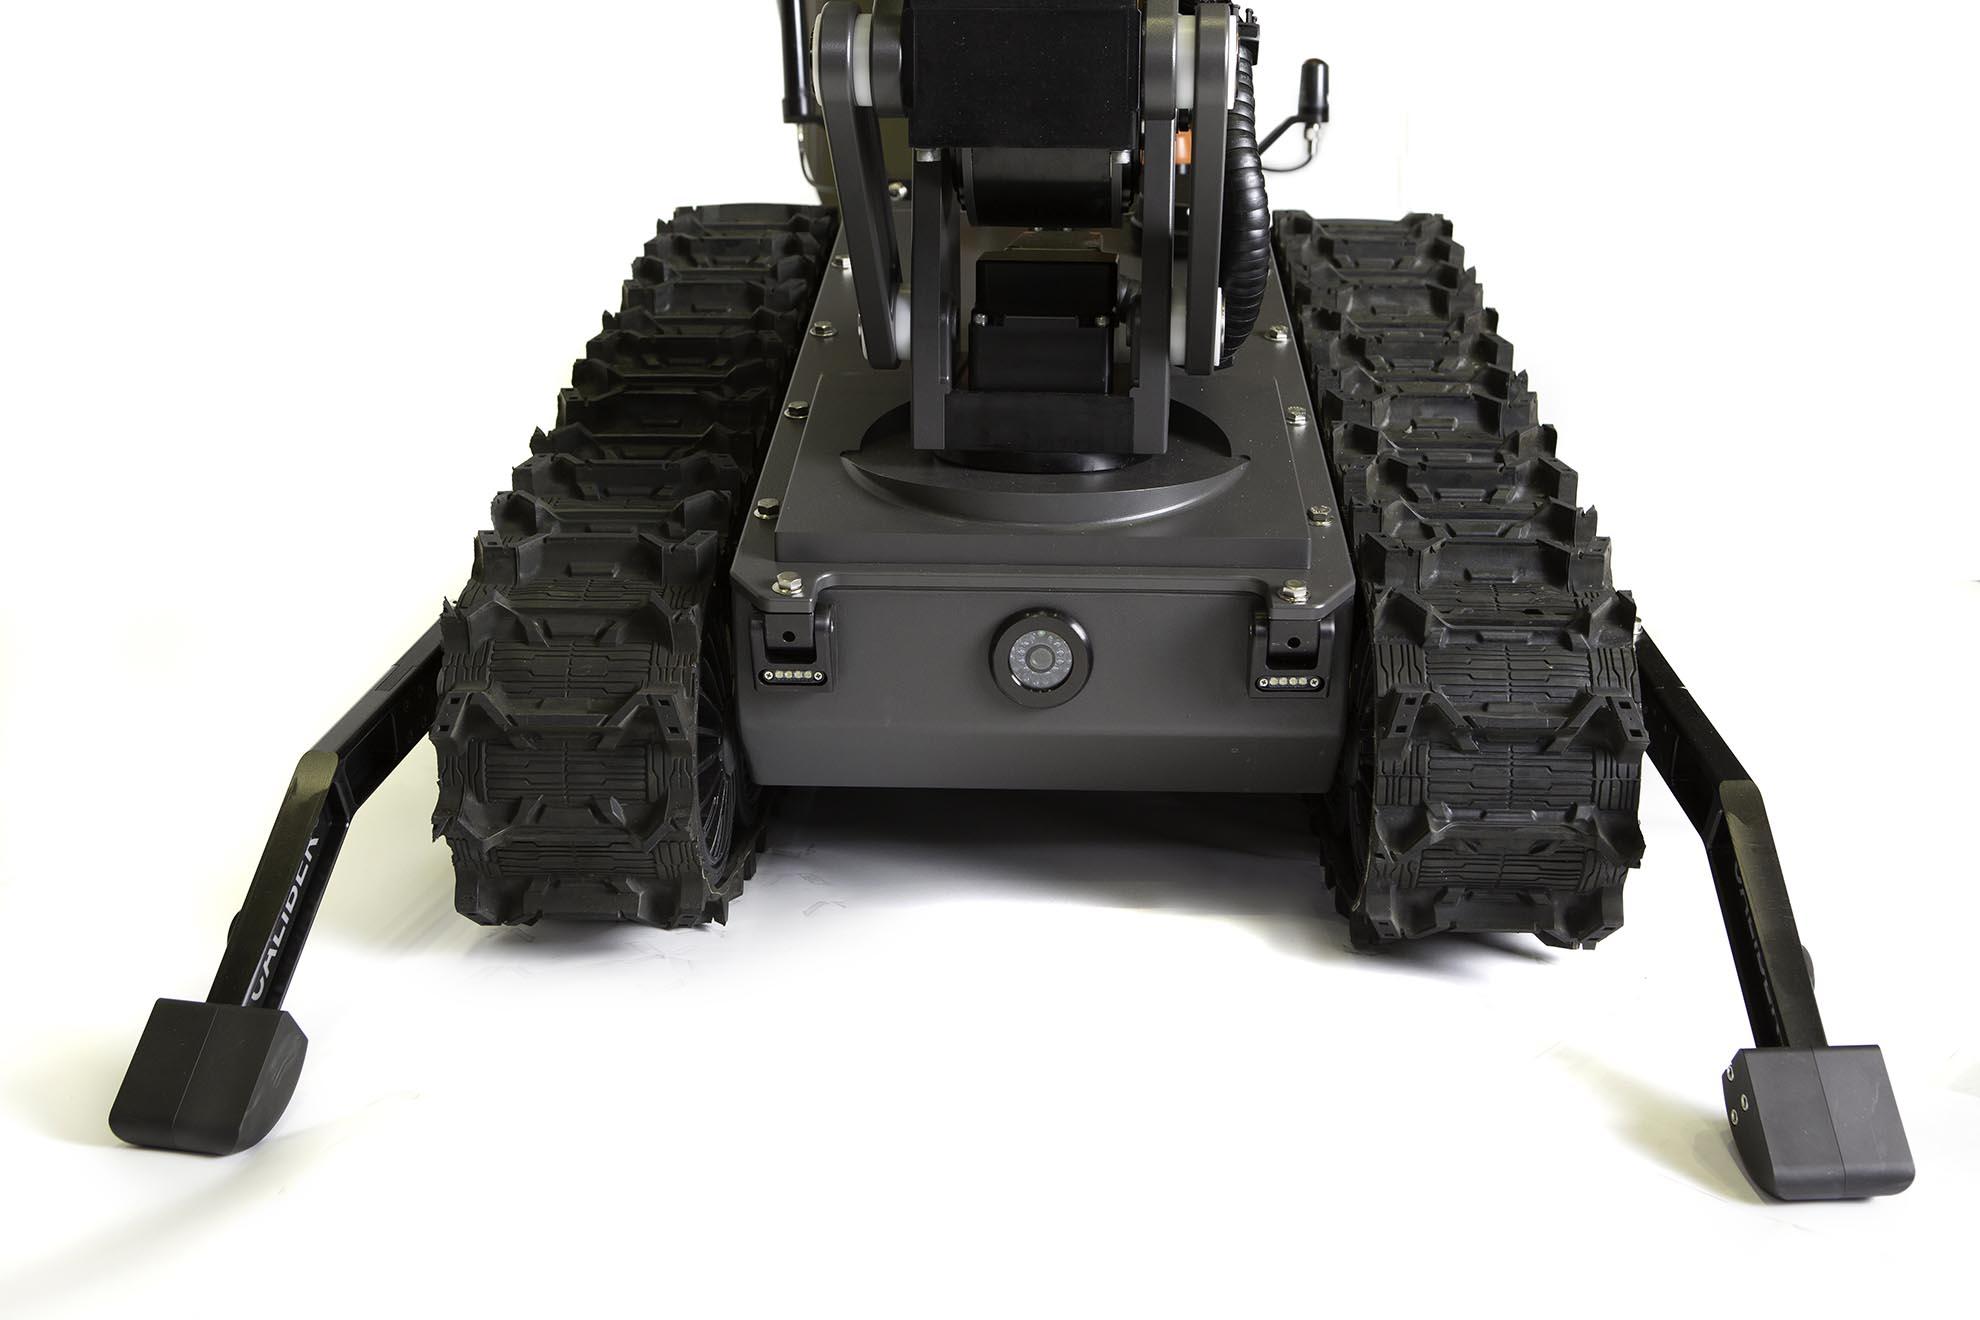 caliber-mk4-lvbied-robot-front-facing-outriggers